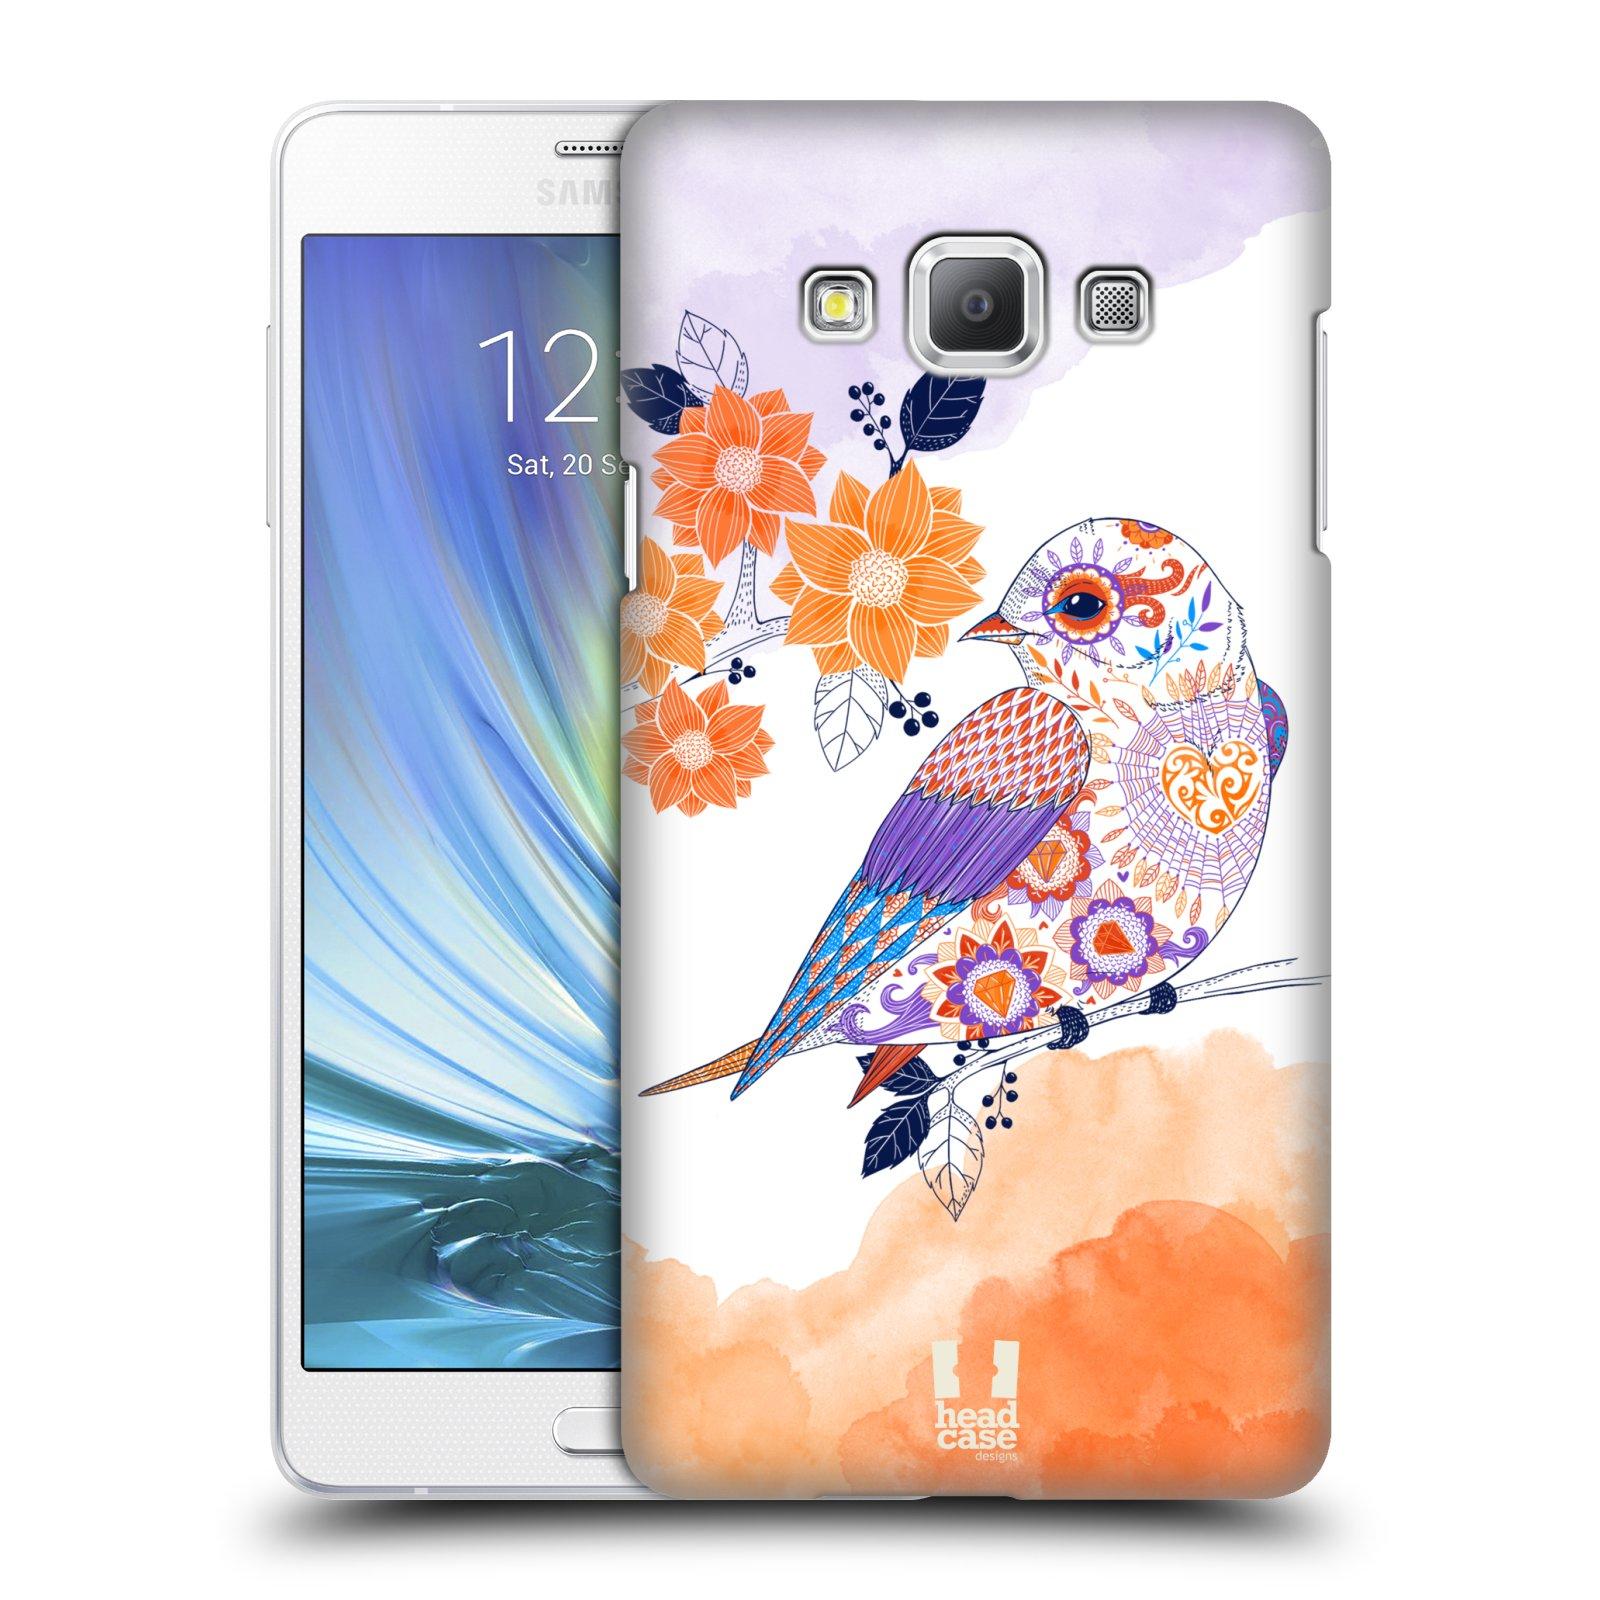 HEAD CASE plastový obal na mobil SAMSUNG GALAXY A7 vzor Květina ptáčci ORANŽOVÁ